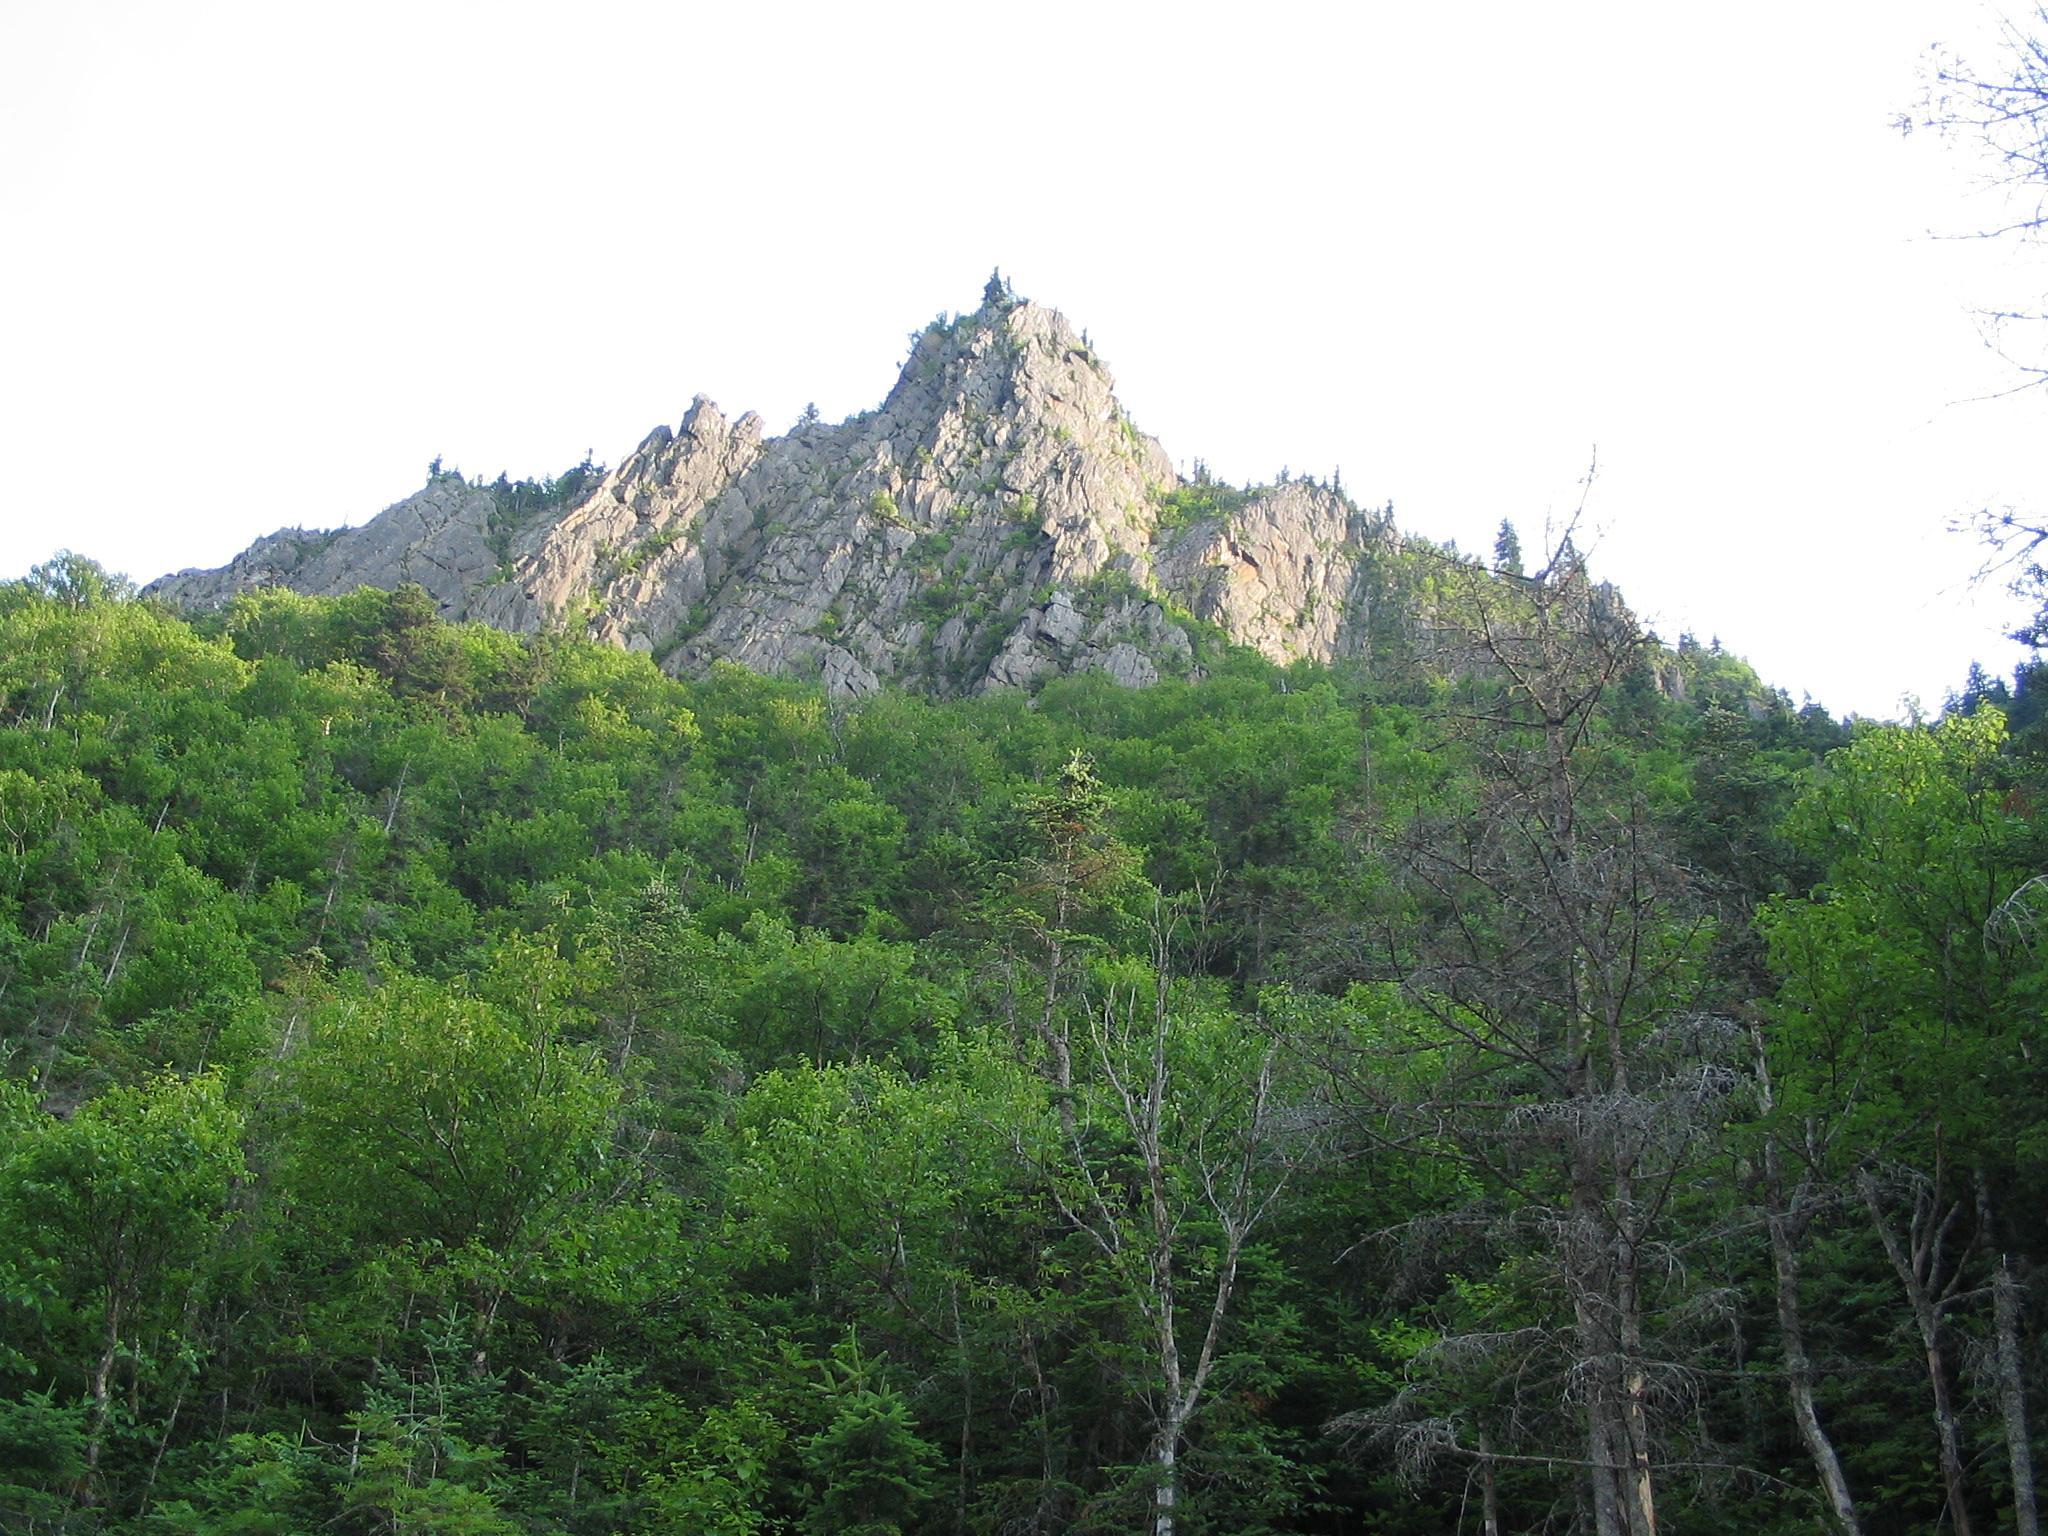 hiking by pauline